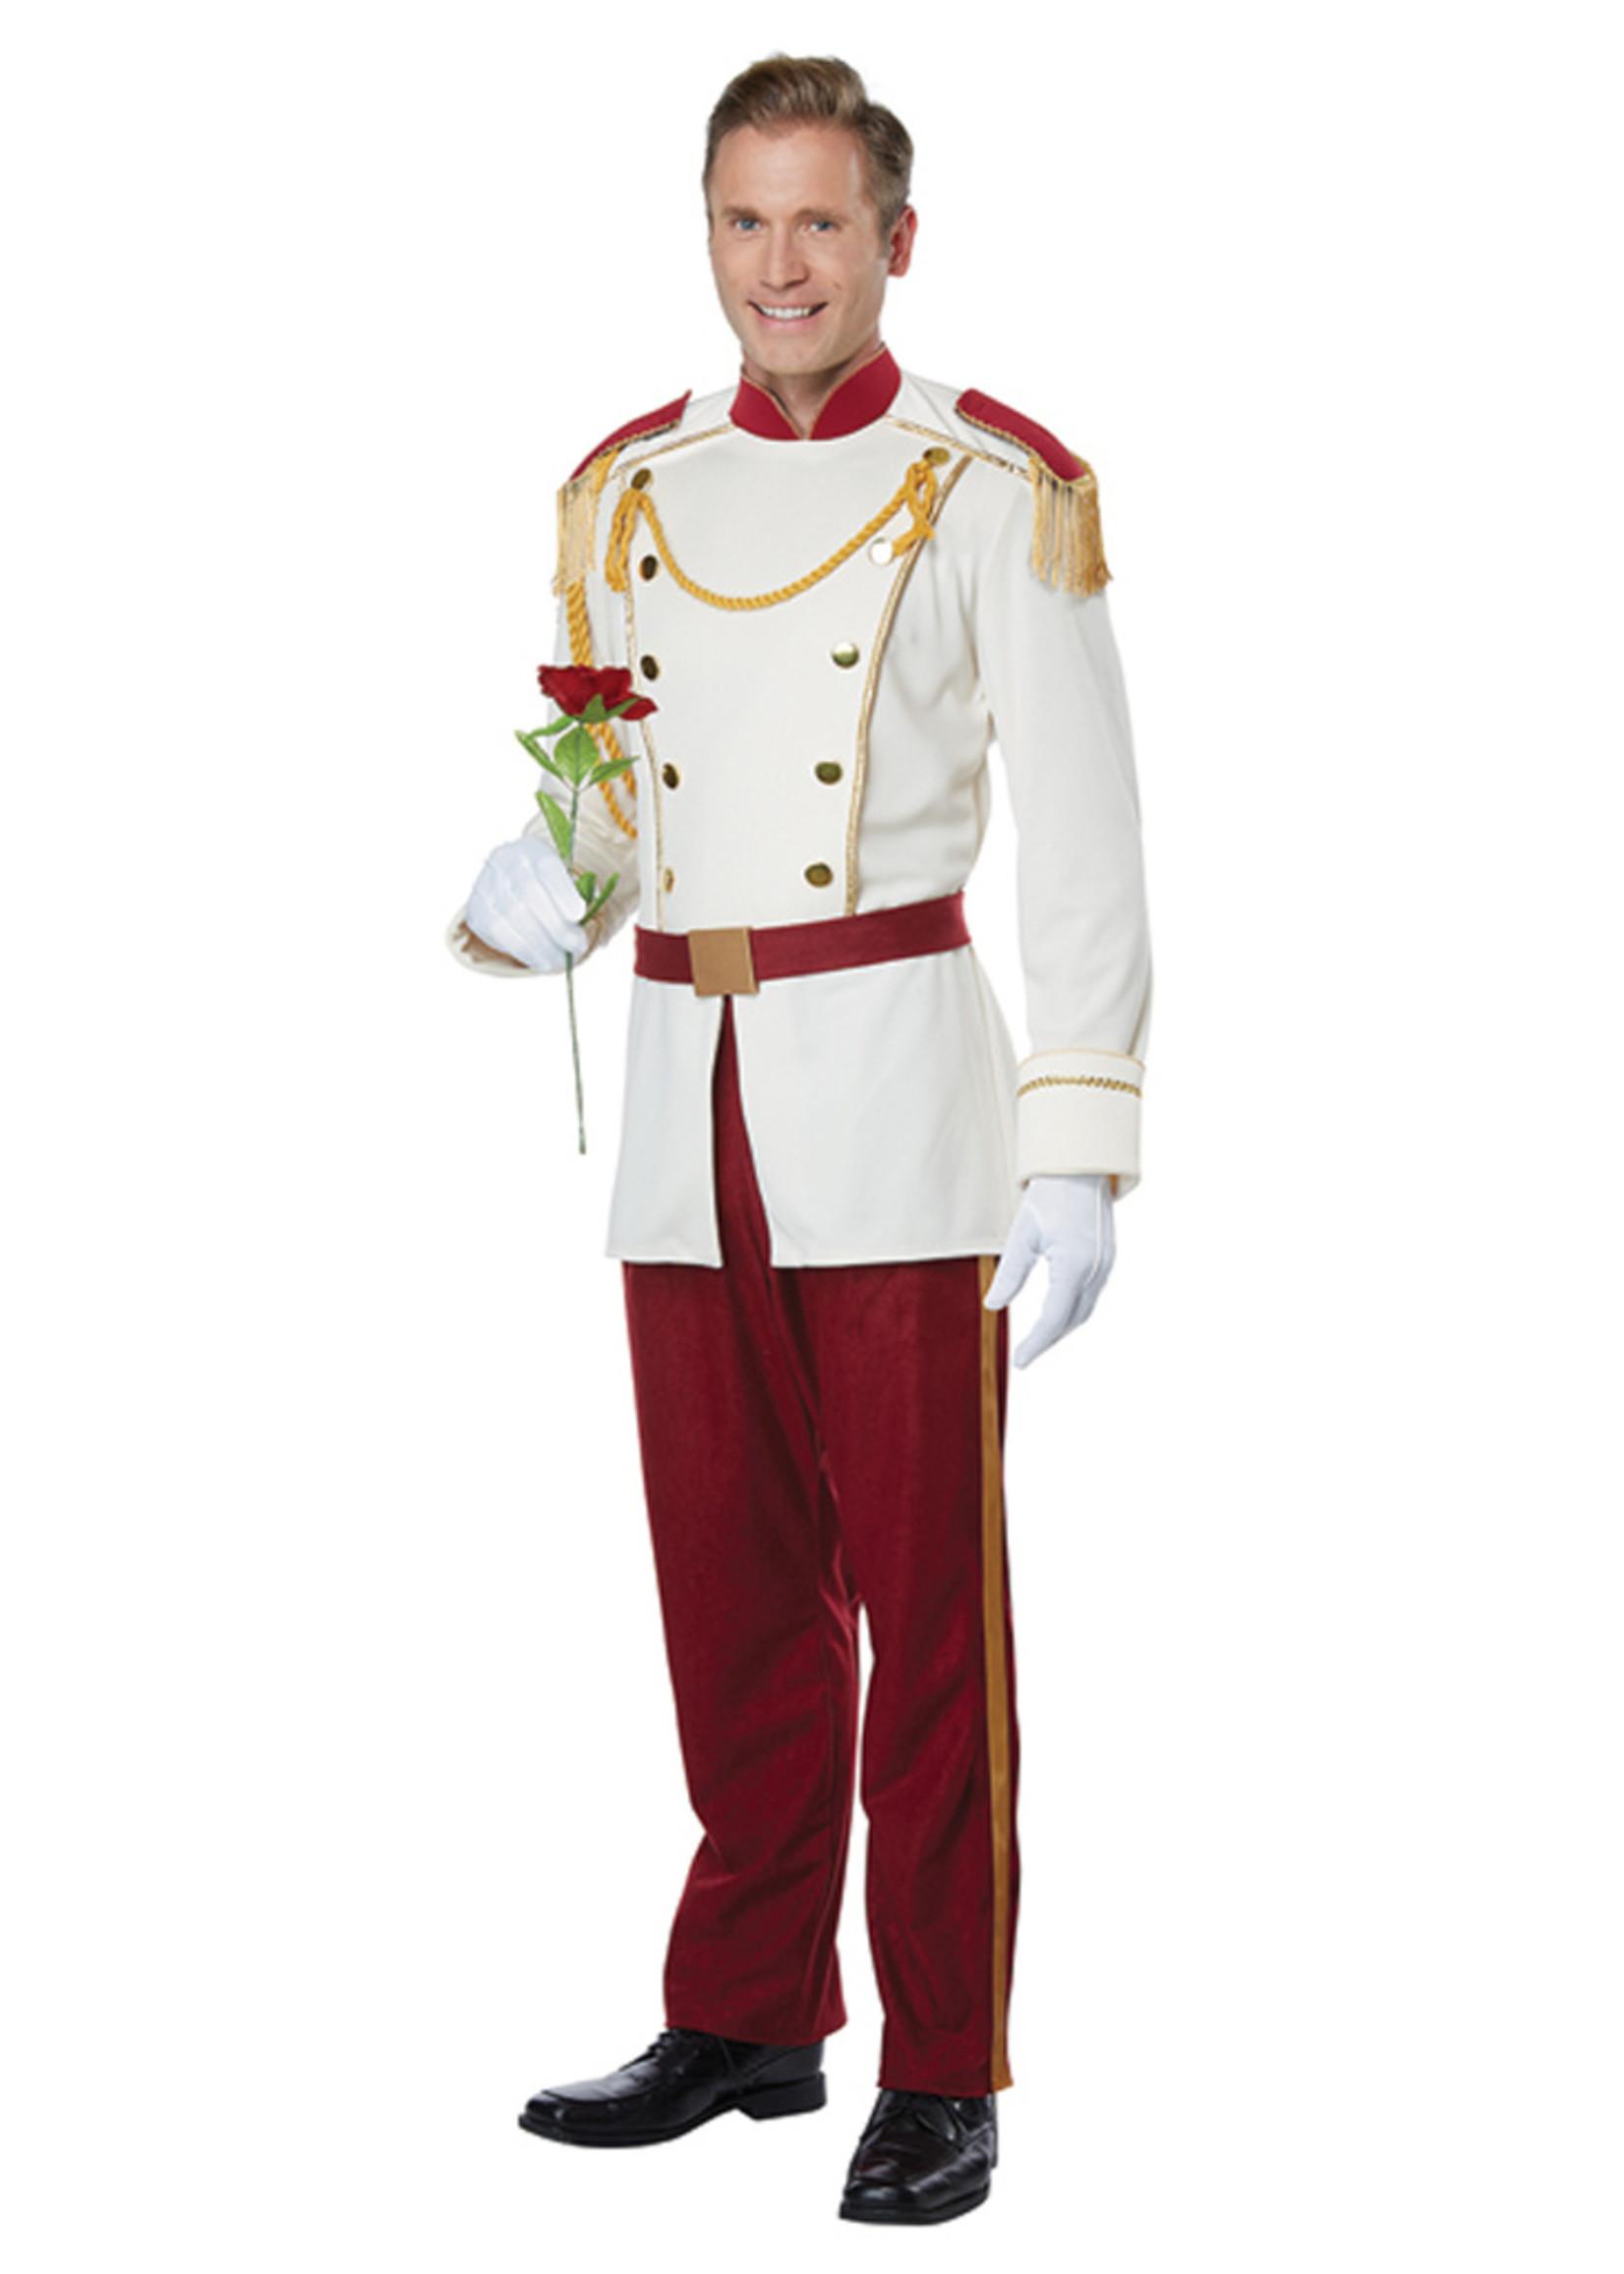 Royal Storybook Prince Costume - Men's